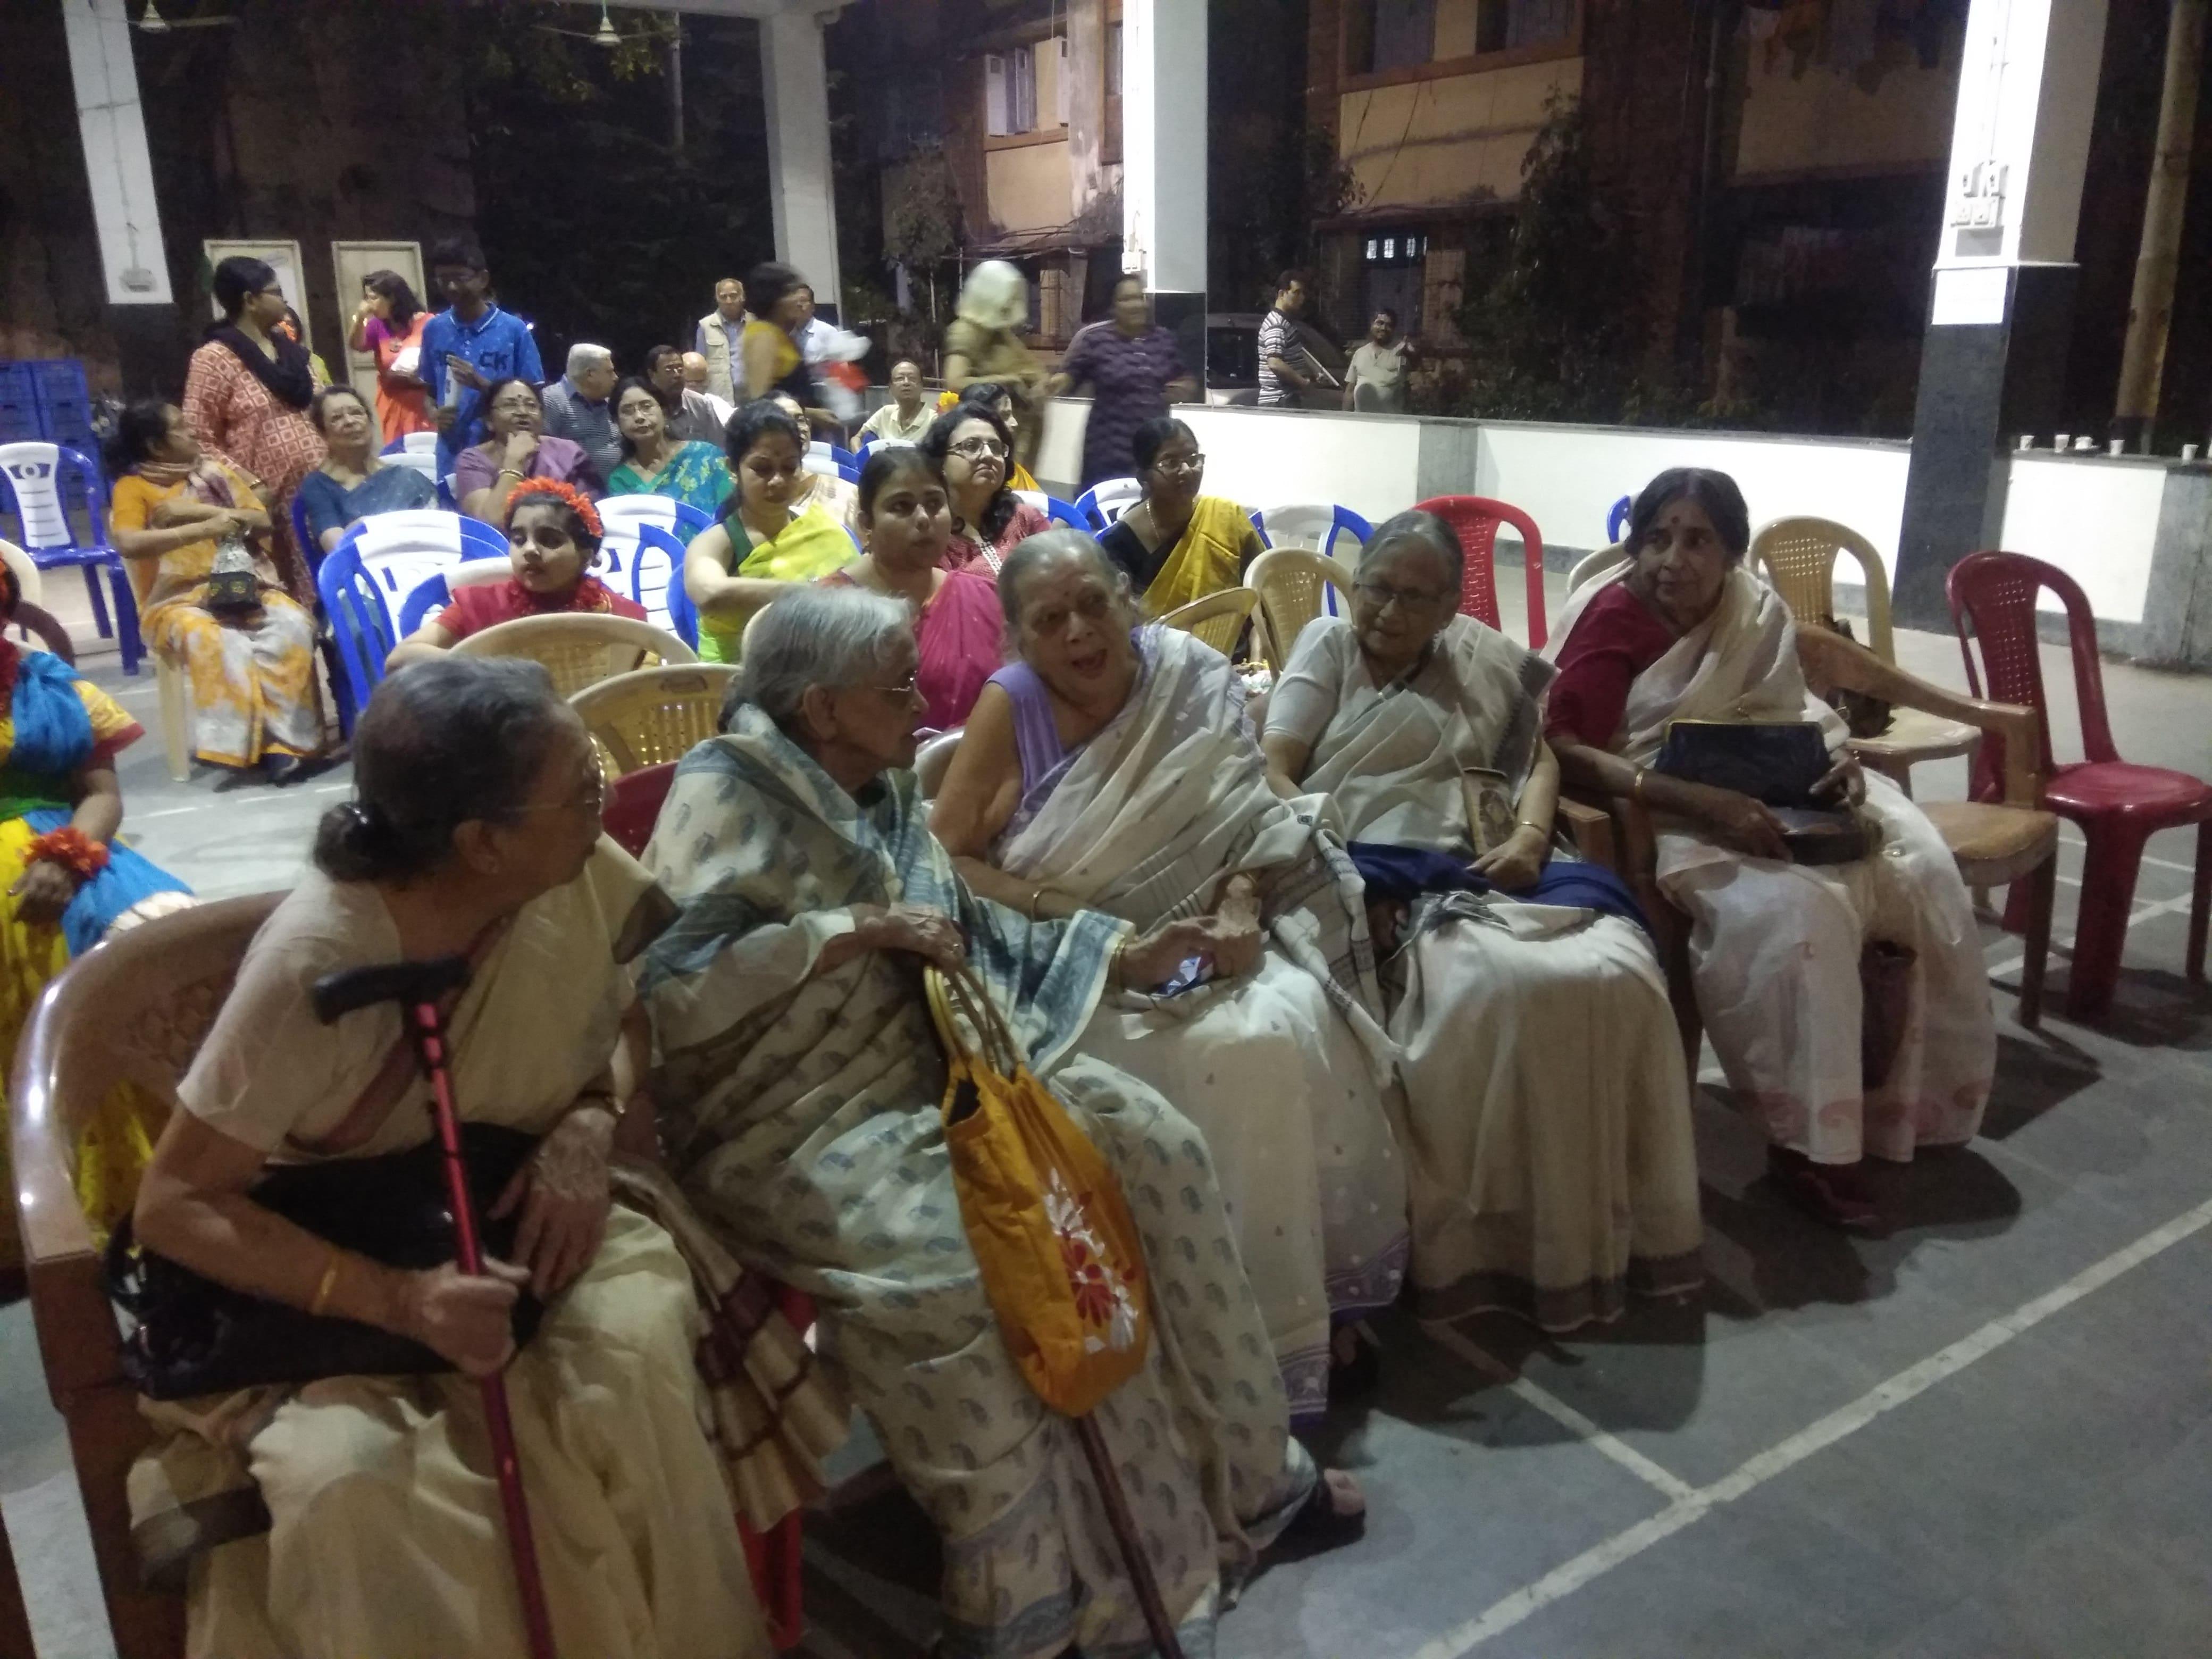 Seniors are enjoying the show